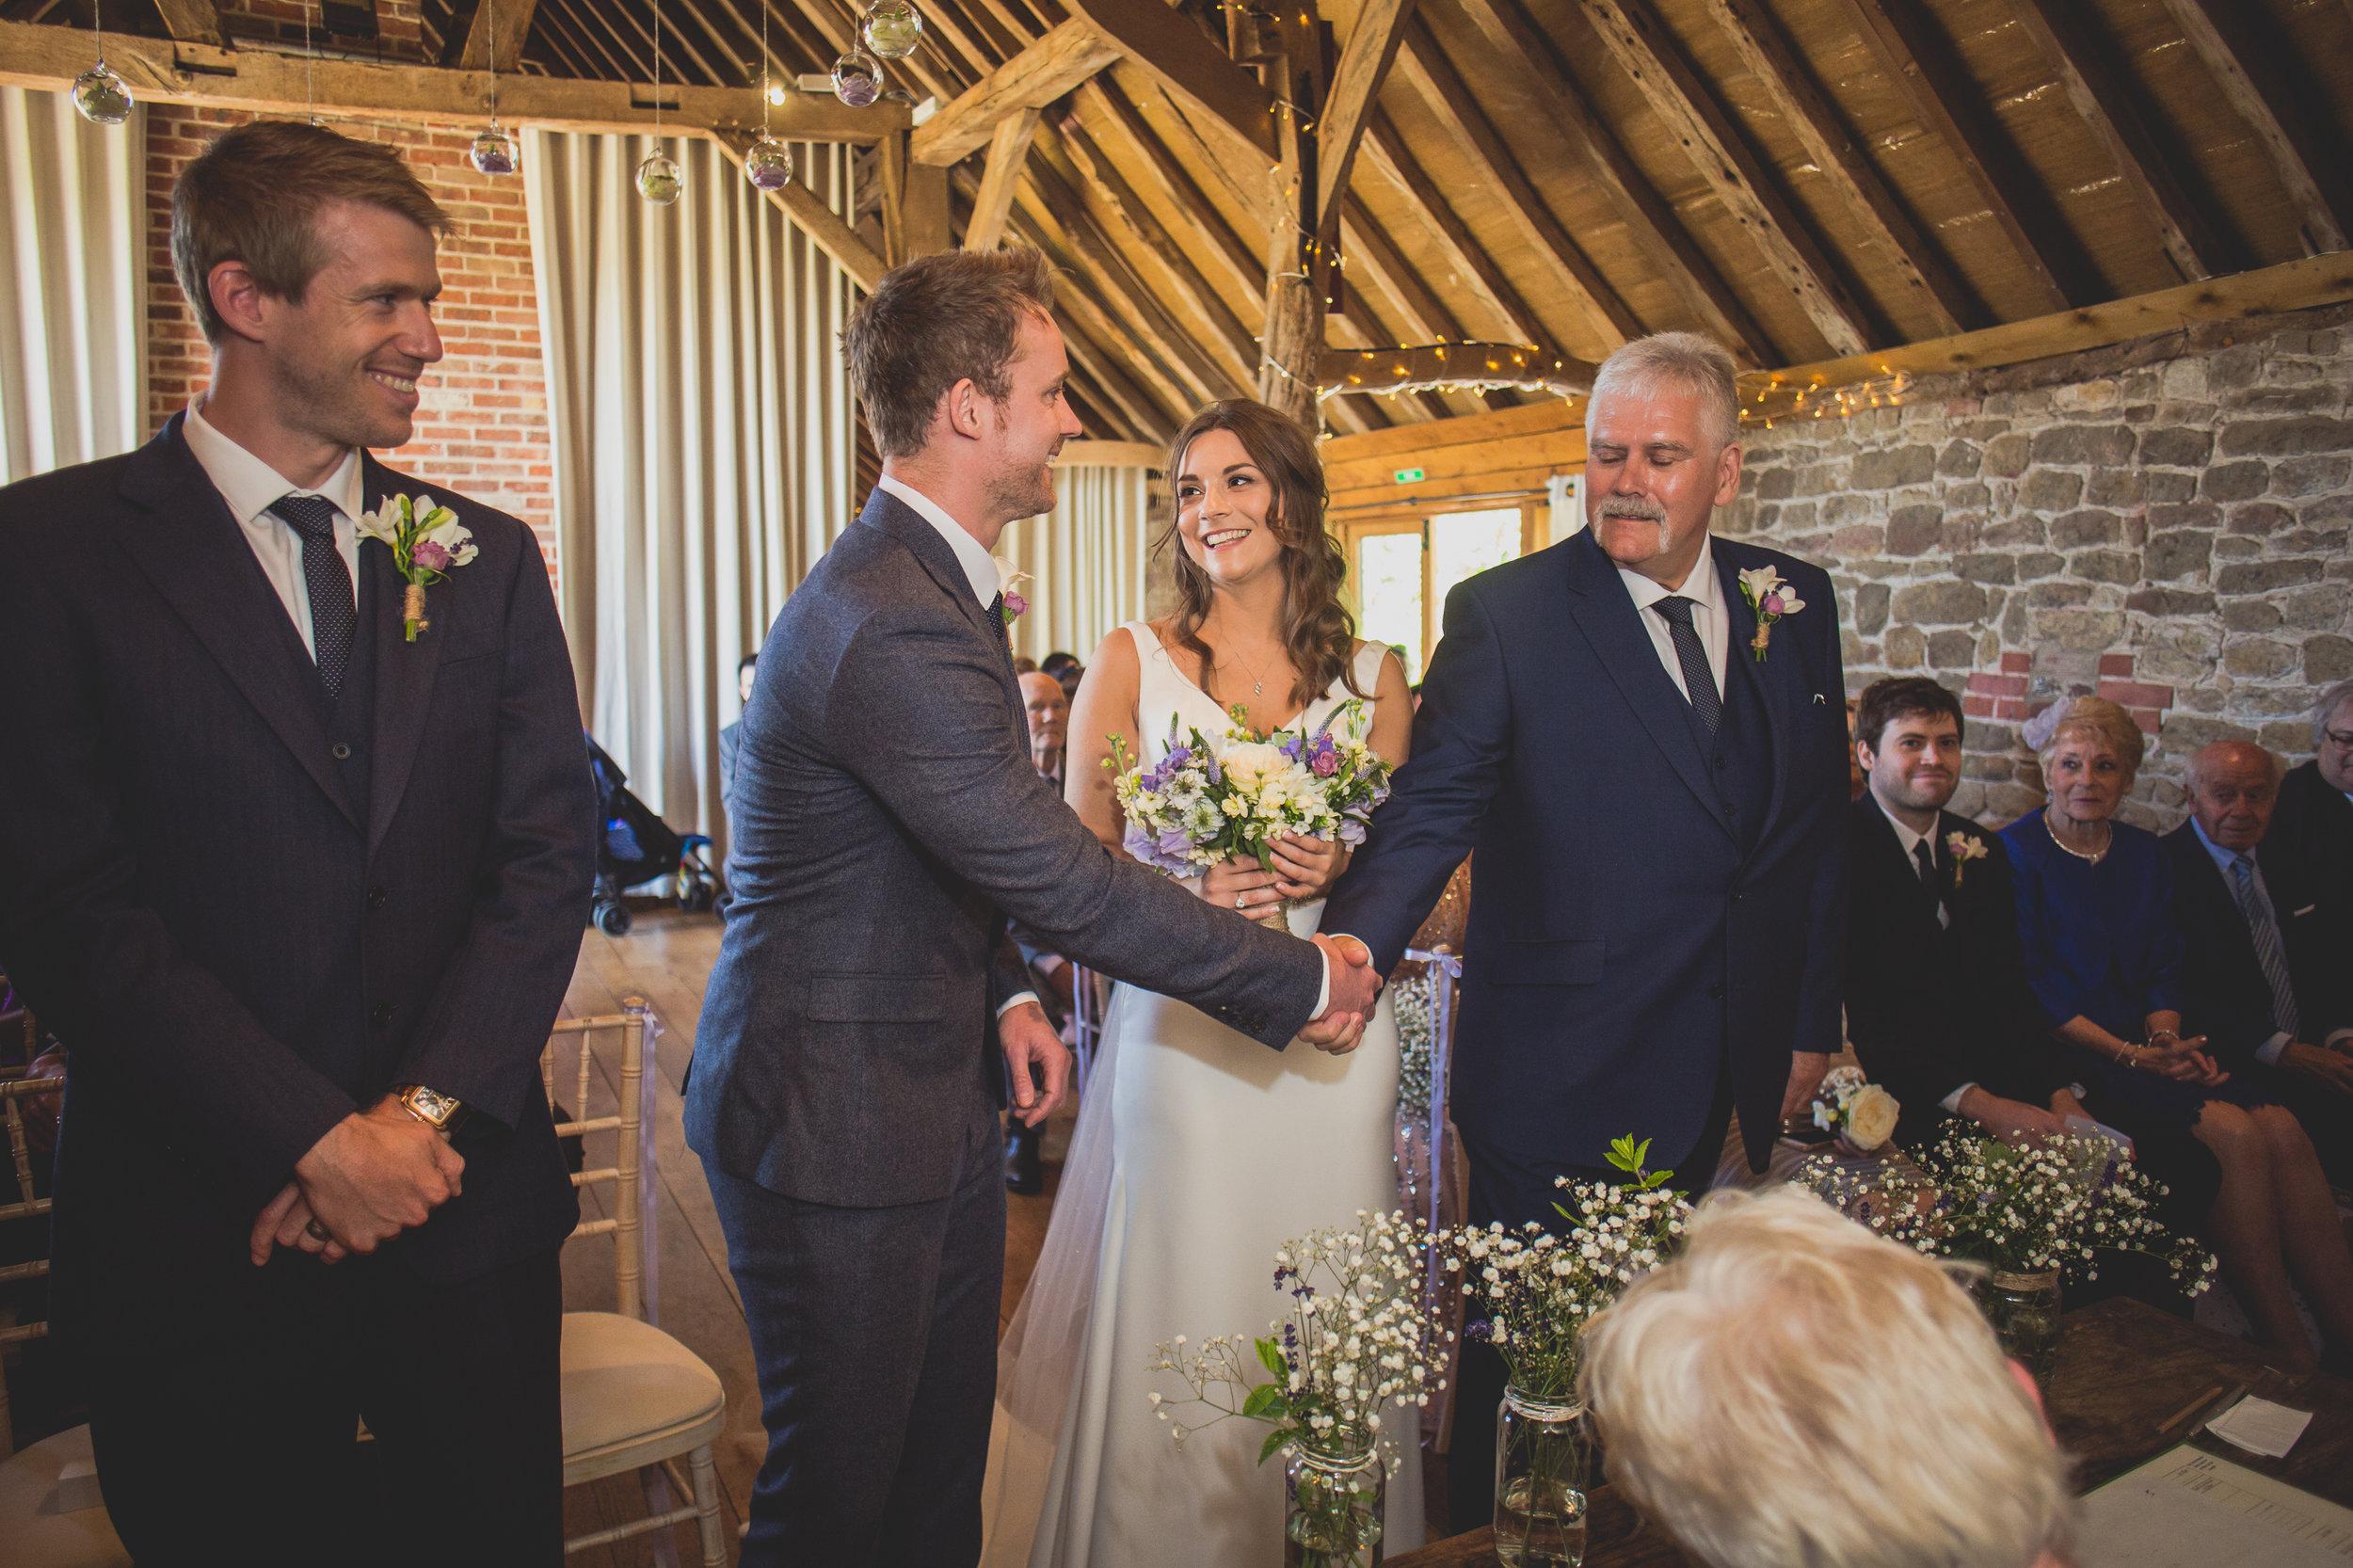 Grittenham Barn female wedding photographers west sussex petworth social-51.jpg